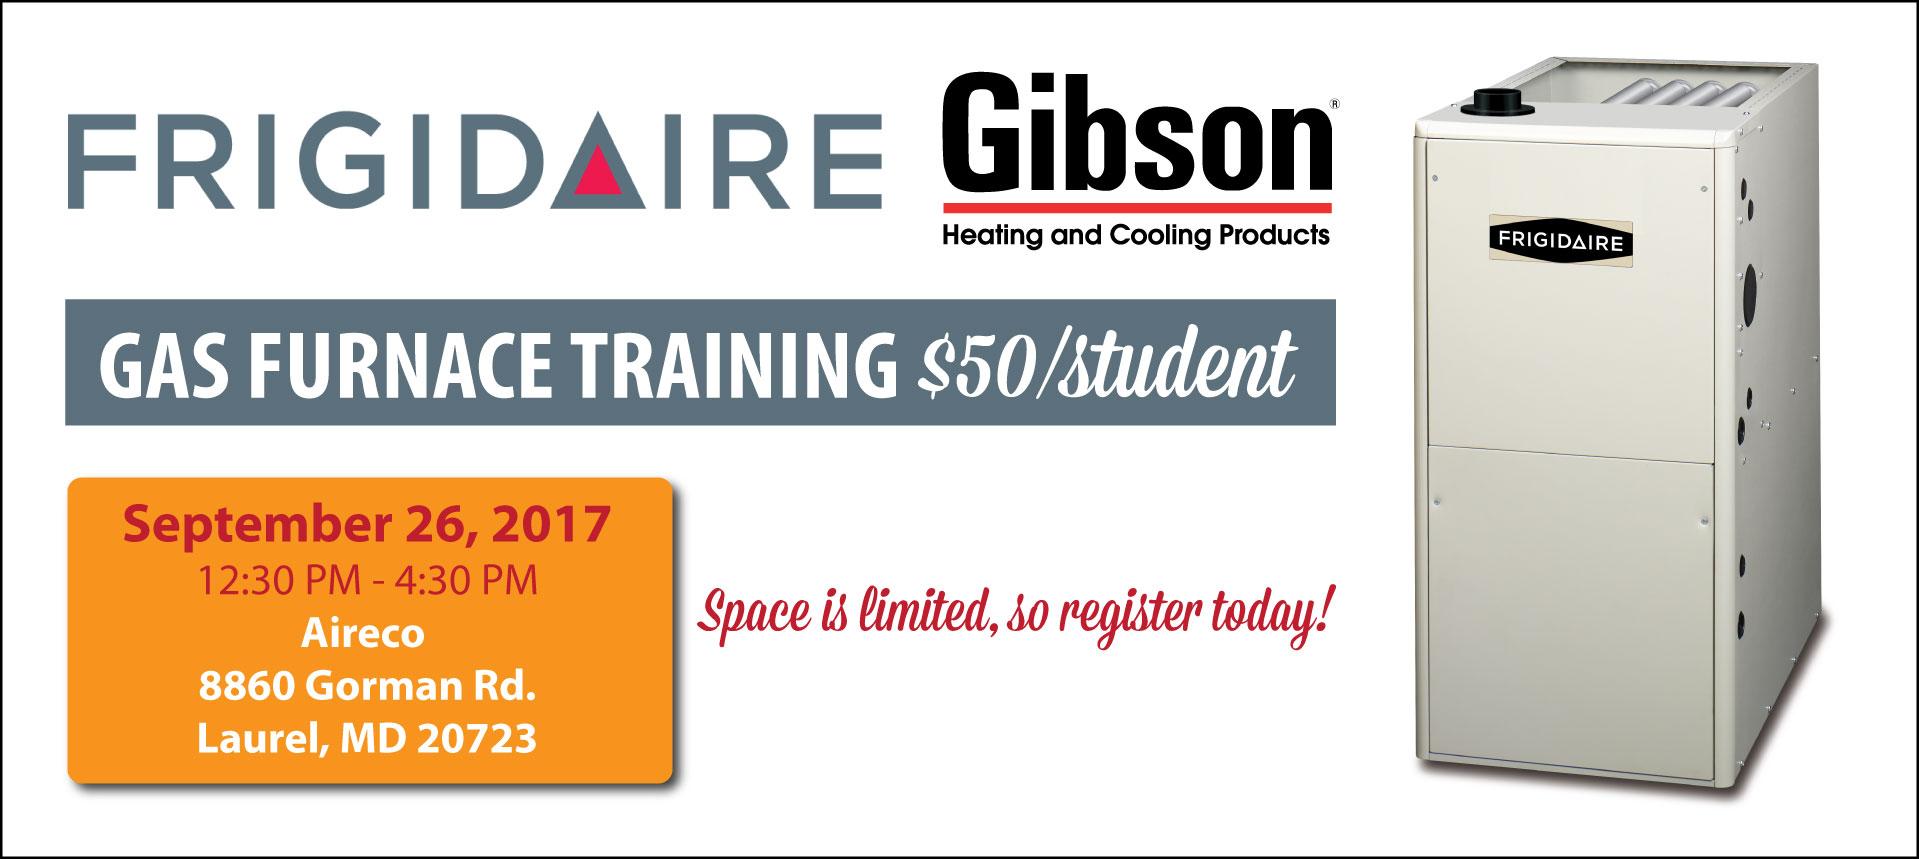 Frigidaire/Gibson Gas Furnace Training  -  Sept. 26, 2017 (Laurel, MD)